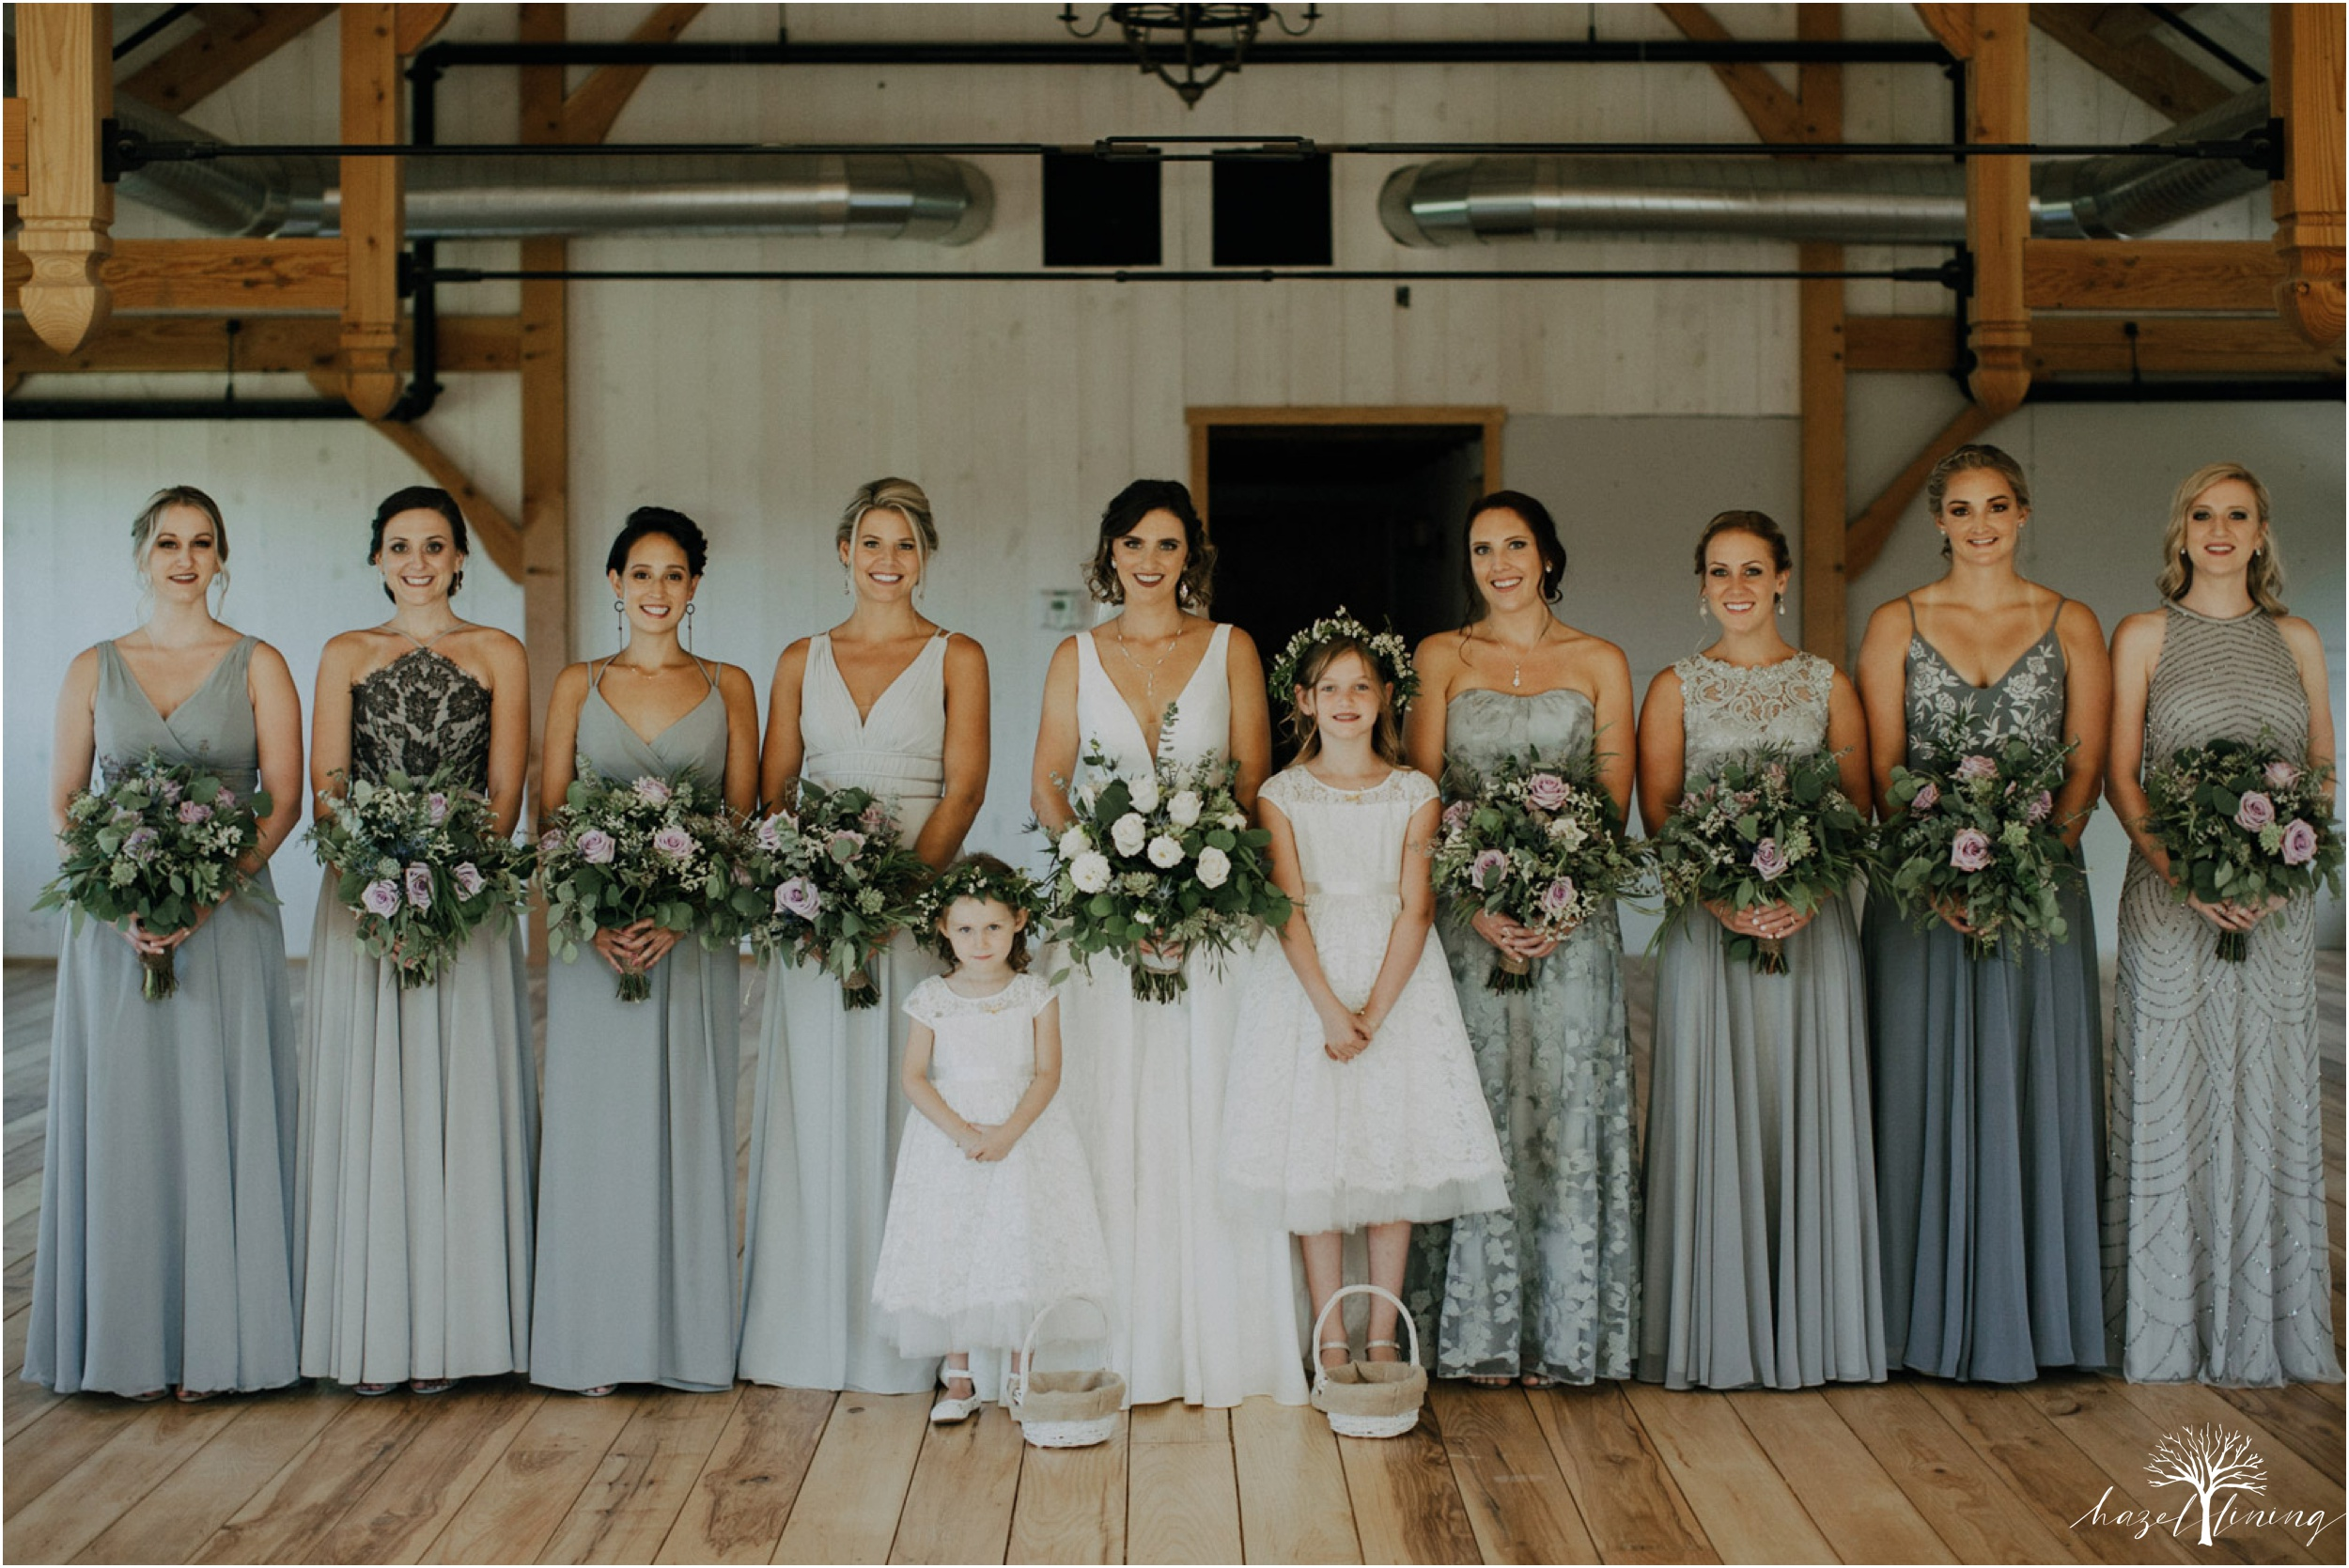 maureen-hepner-anthony-giordano-rose-bank-winery-newtow-pennsylvania-luxury-summer-wedding-hazel-lining-photography-destination-elopement-wedding-engagement-photography_0037.jpg